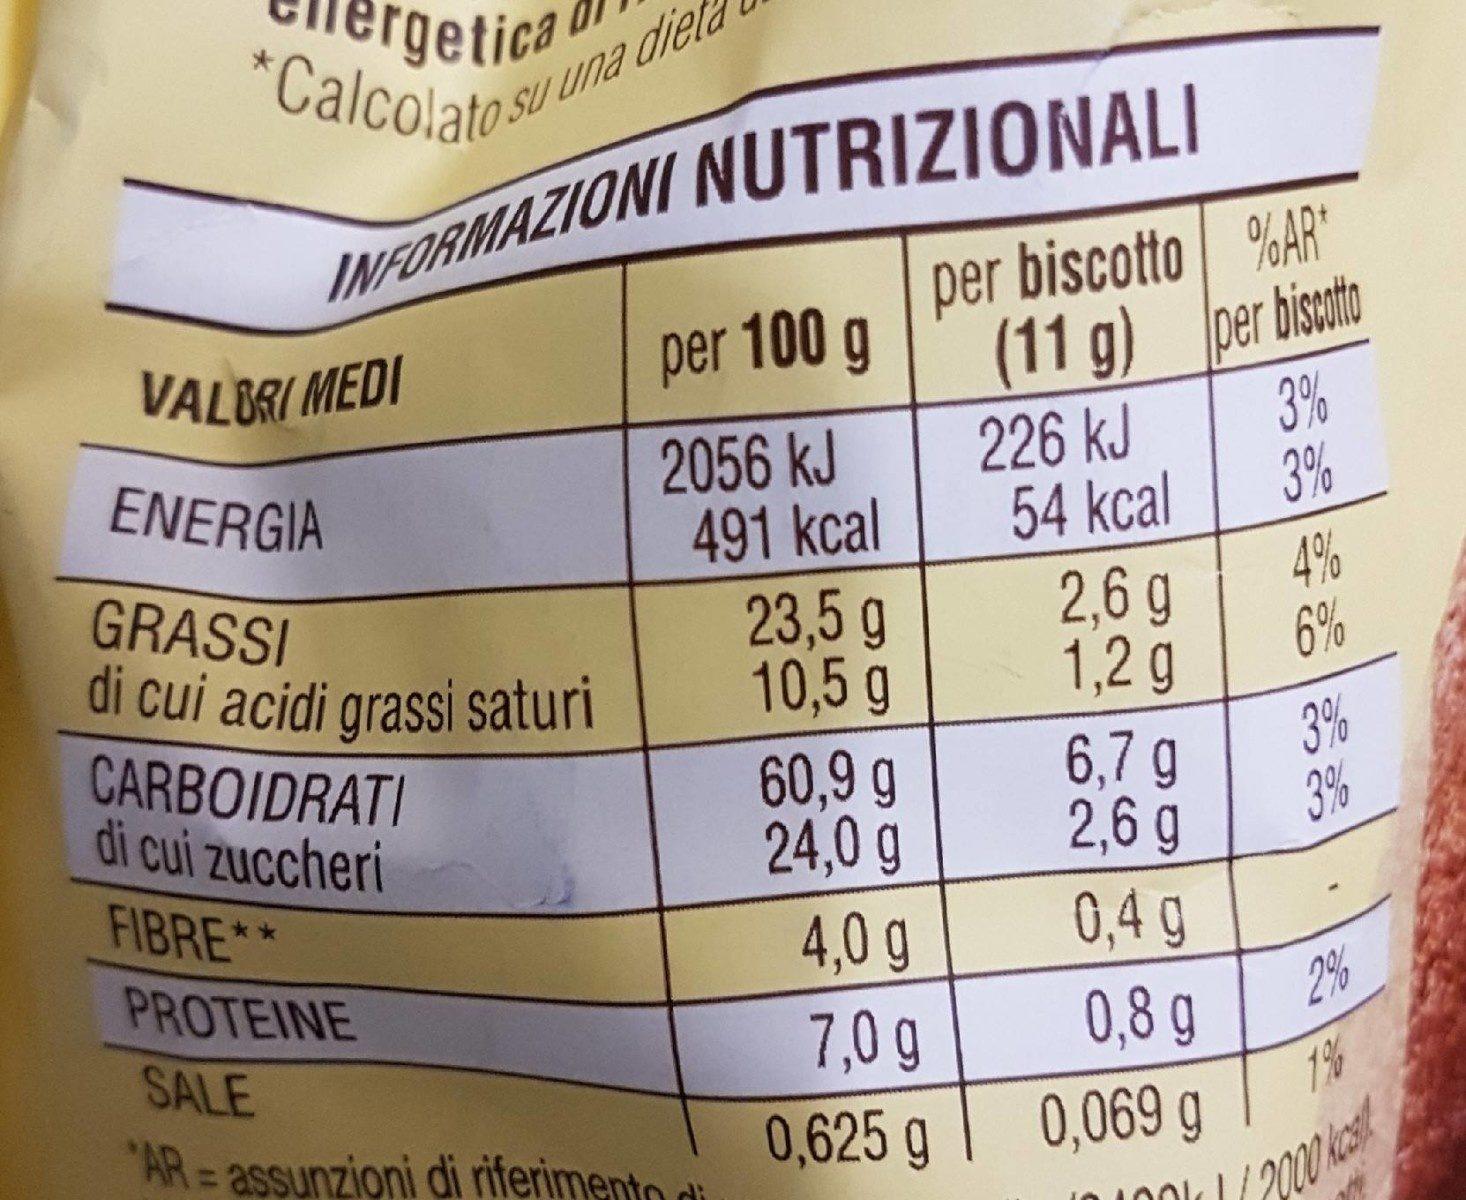 Abbracci fin cacao e panna fresca - Voedingswaarden - fr